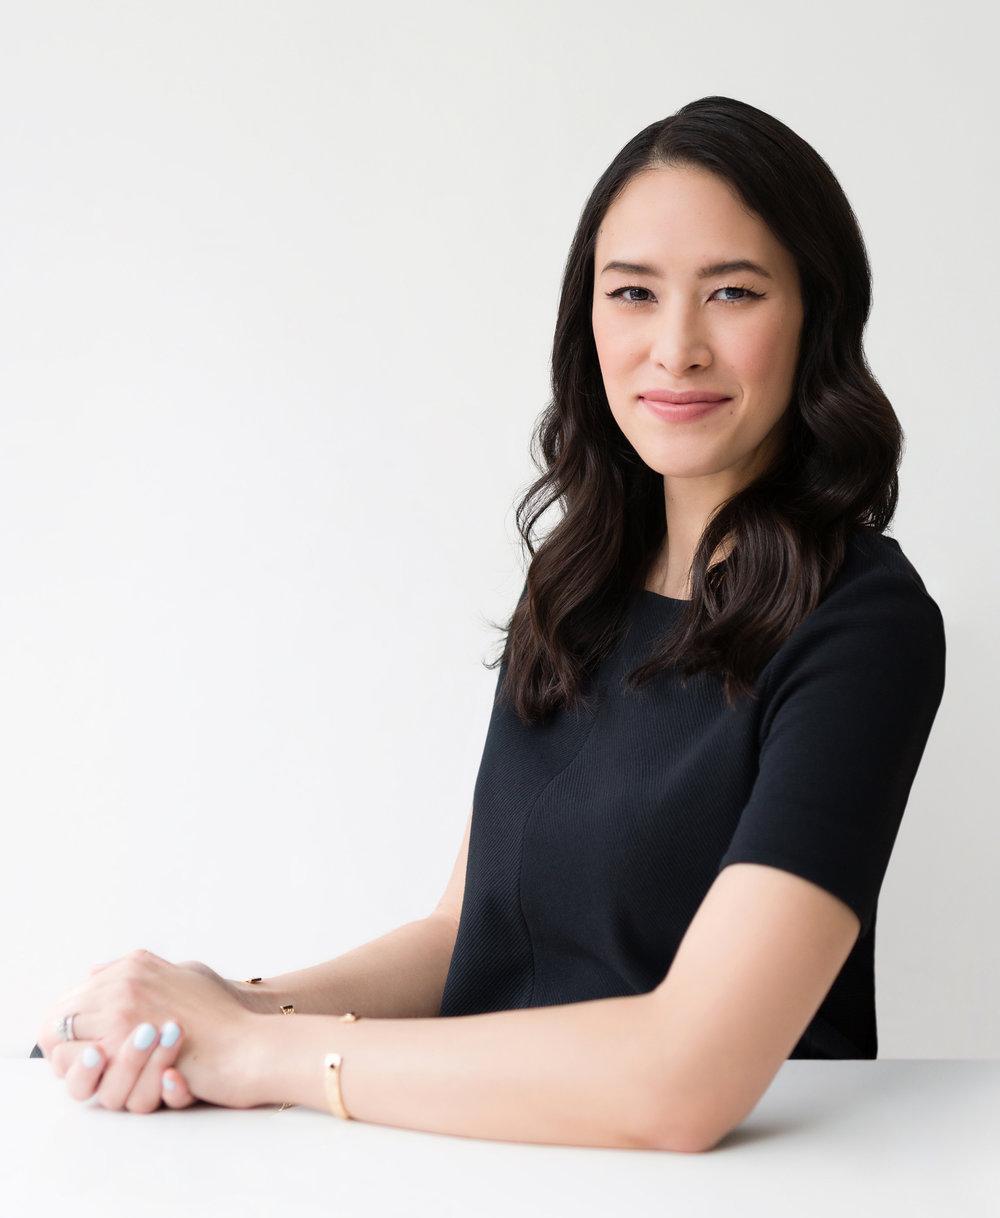 Kim Miller, Principal